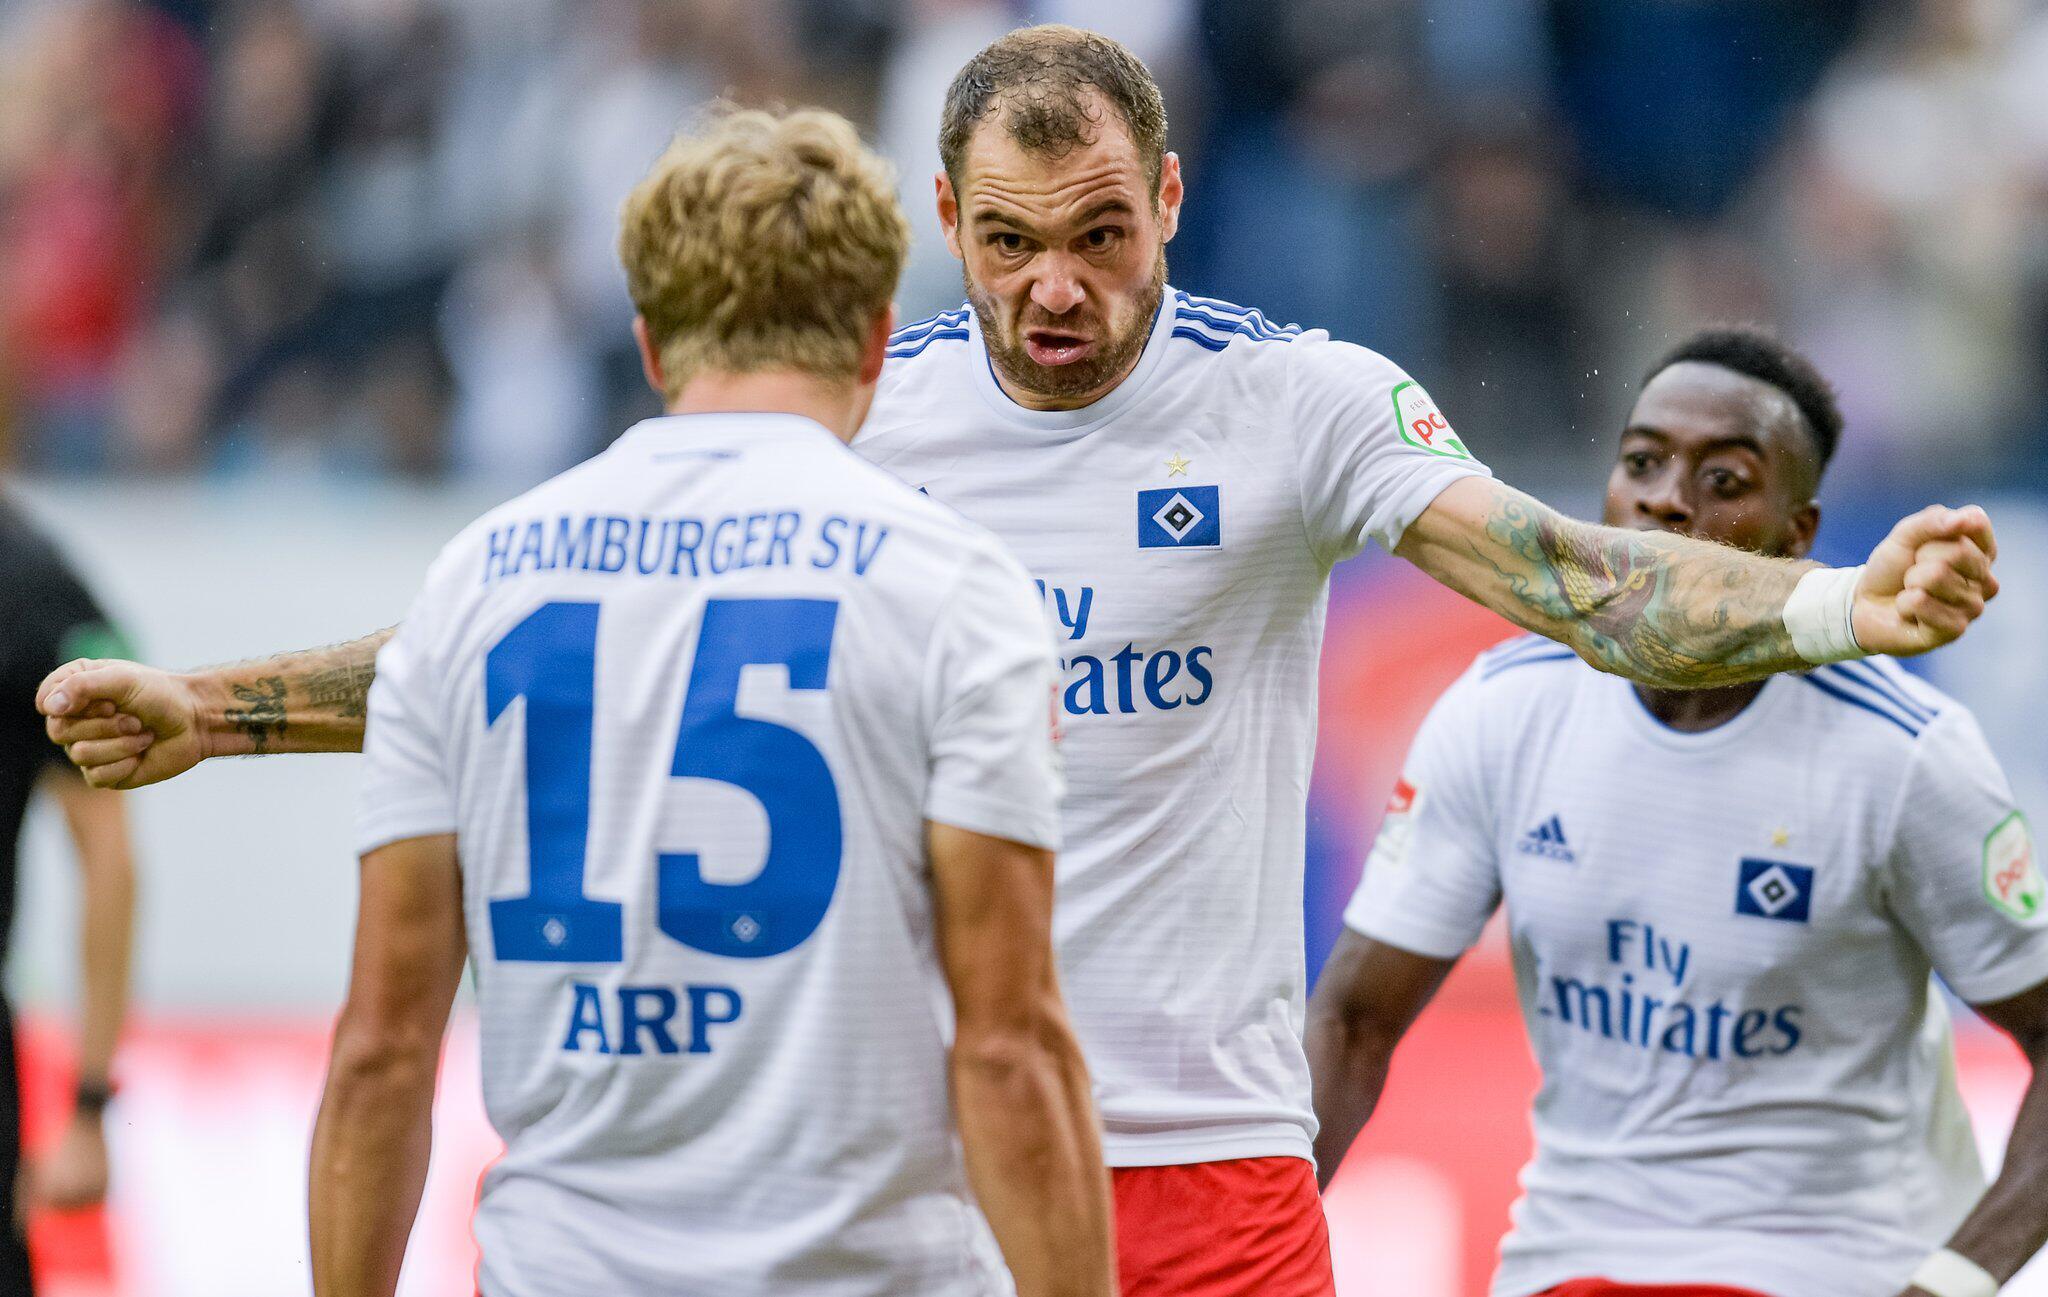 Bild zu Hamburger SV - 1. FC Heidenheim